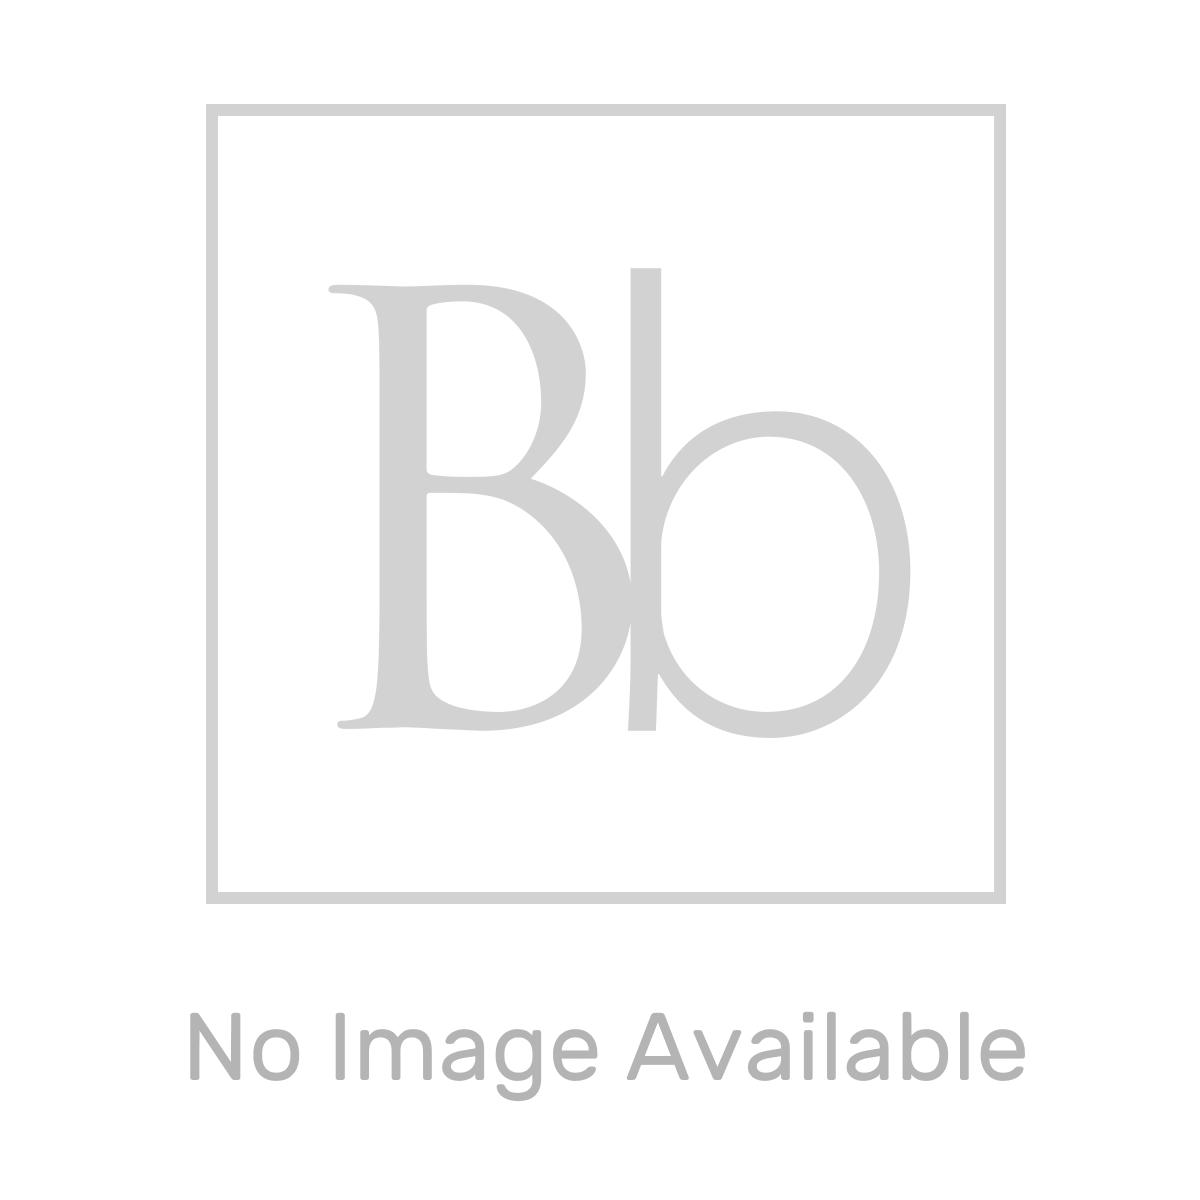 Aquadart Black Slate Shower Tray 1700 x 800